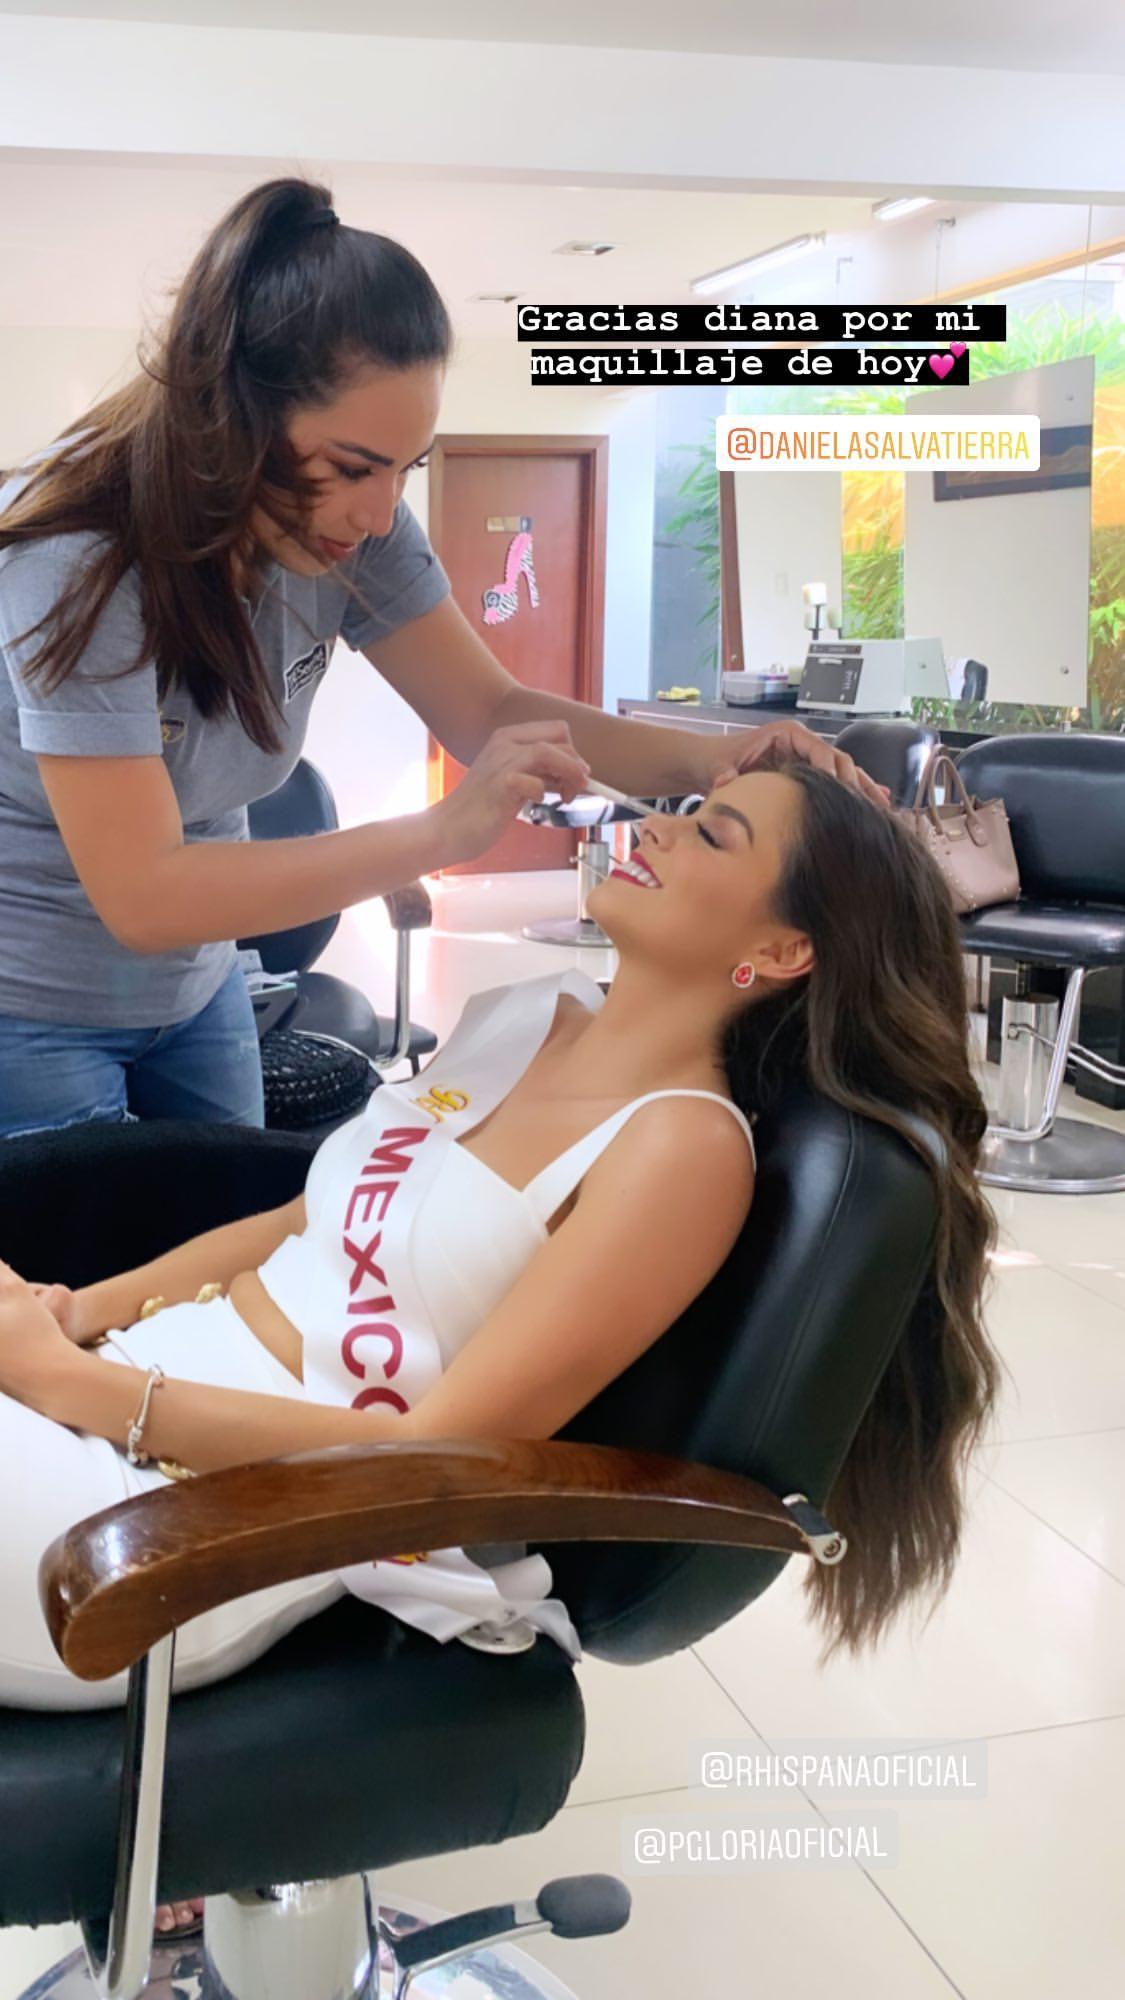 regina peredo, reyna hispanoamericana 2019. - Página 5 83698010